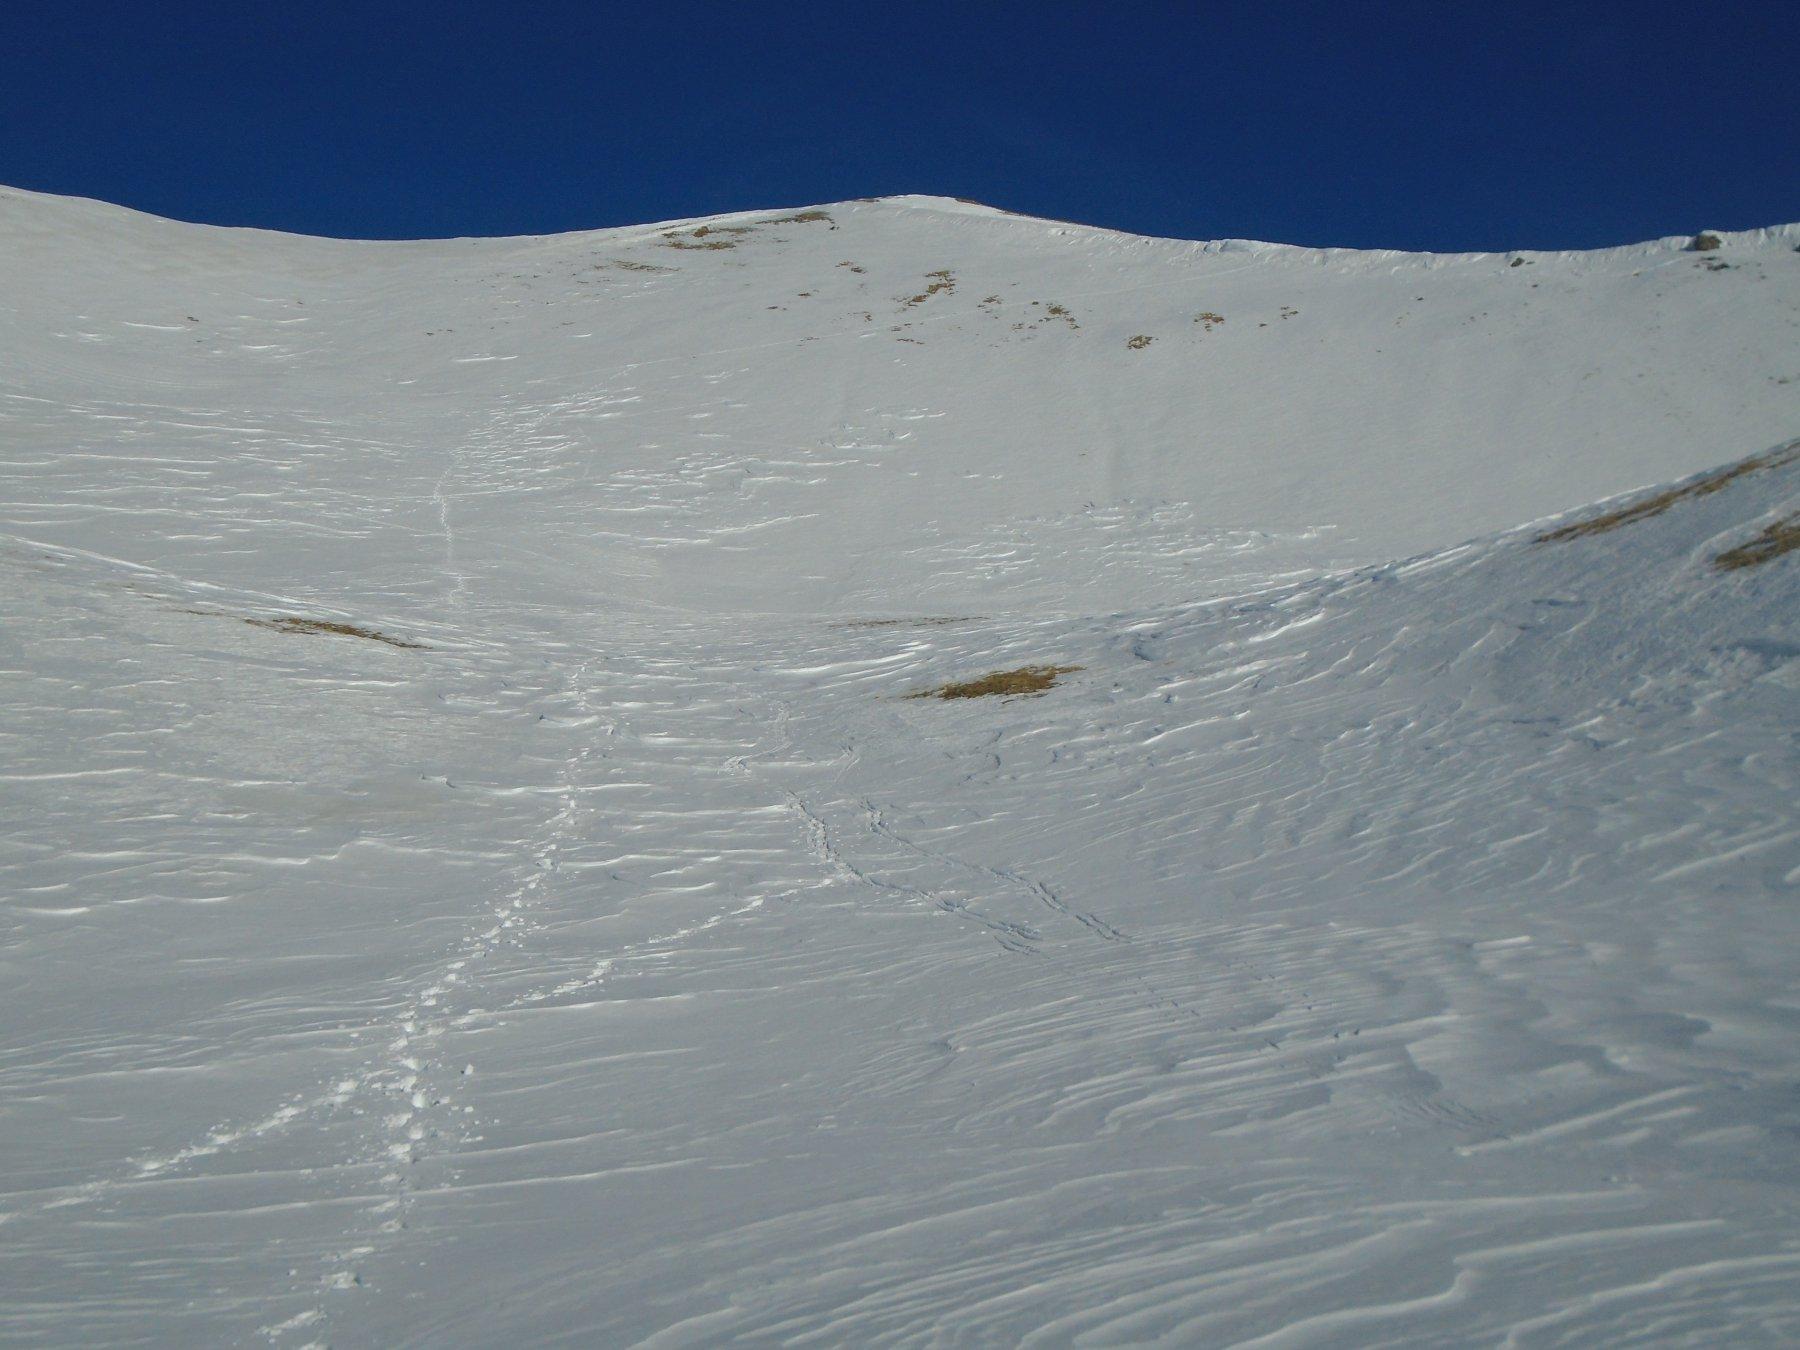 Poca neve sui ripidi pendii sopra la conca finale